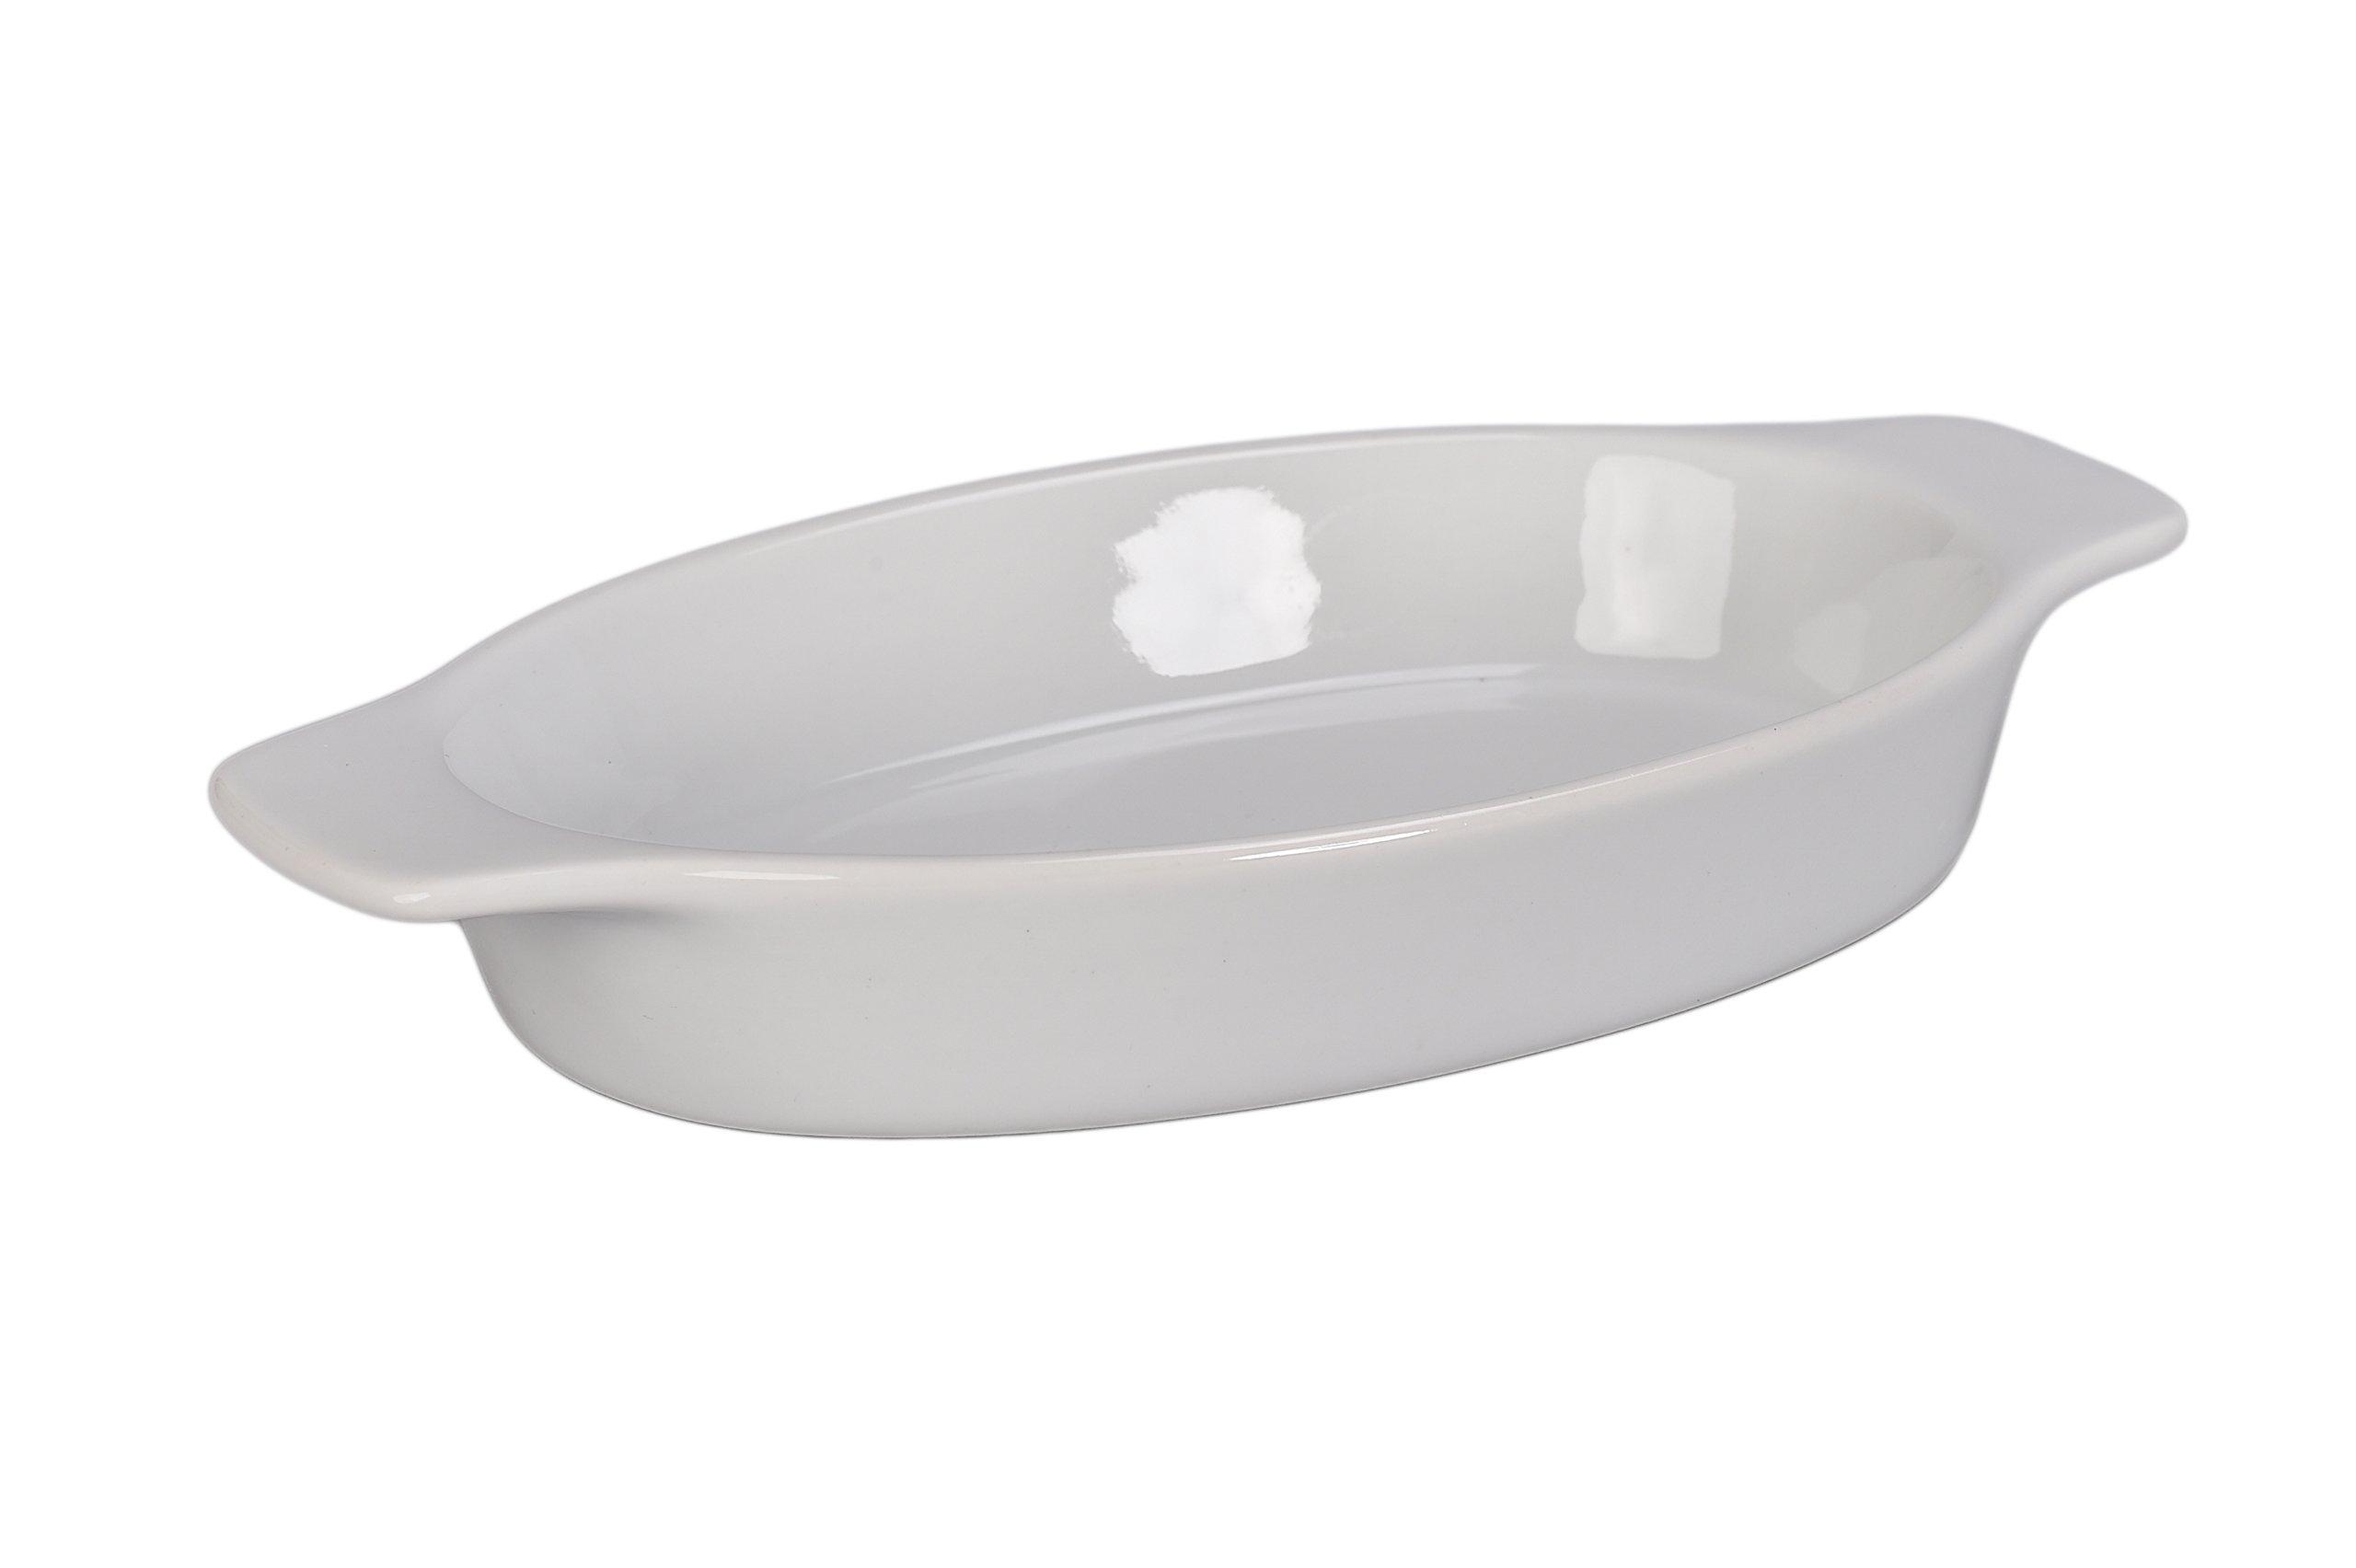 BIA Cordon Bleu 904998S4SIOC Au Gratin Porcelain Baking Dish, Large, White